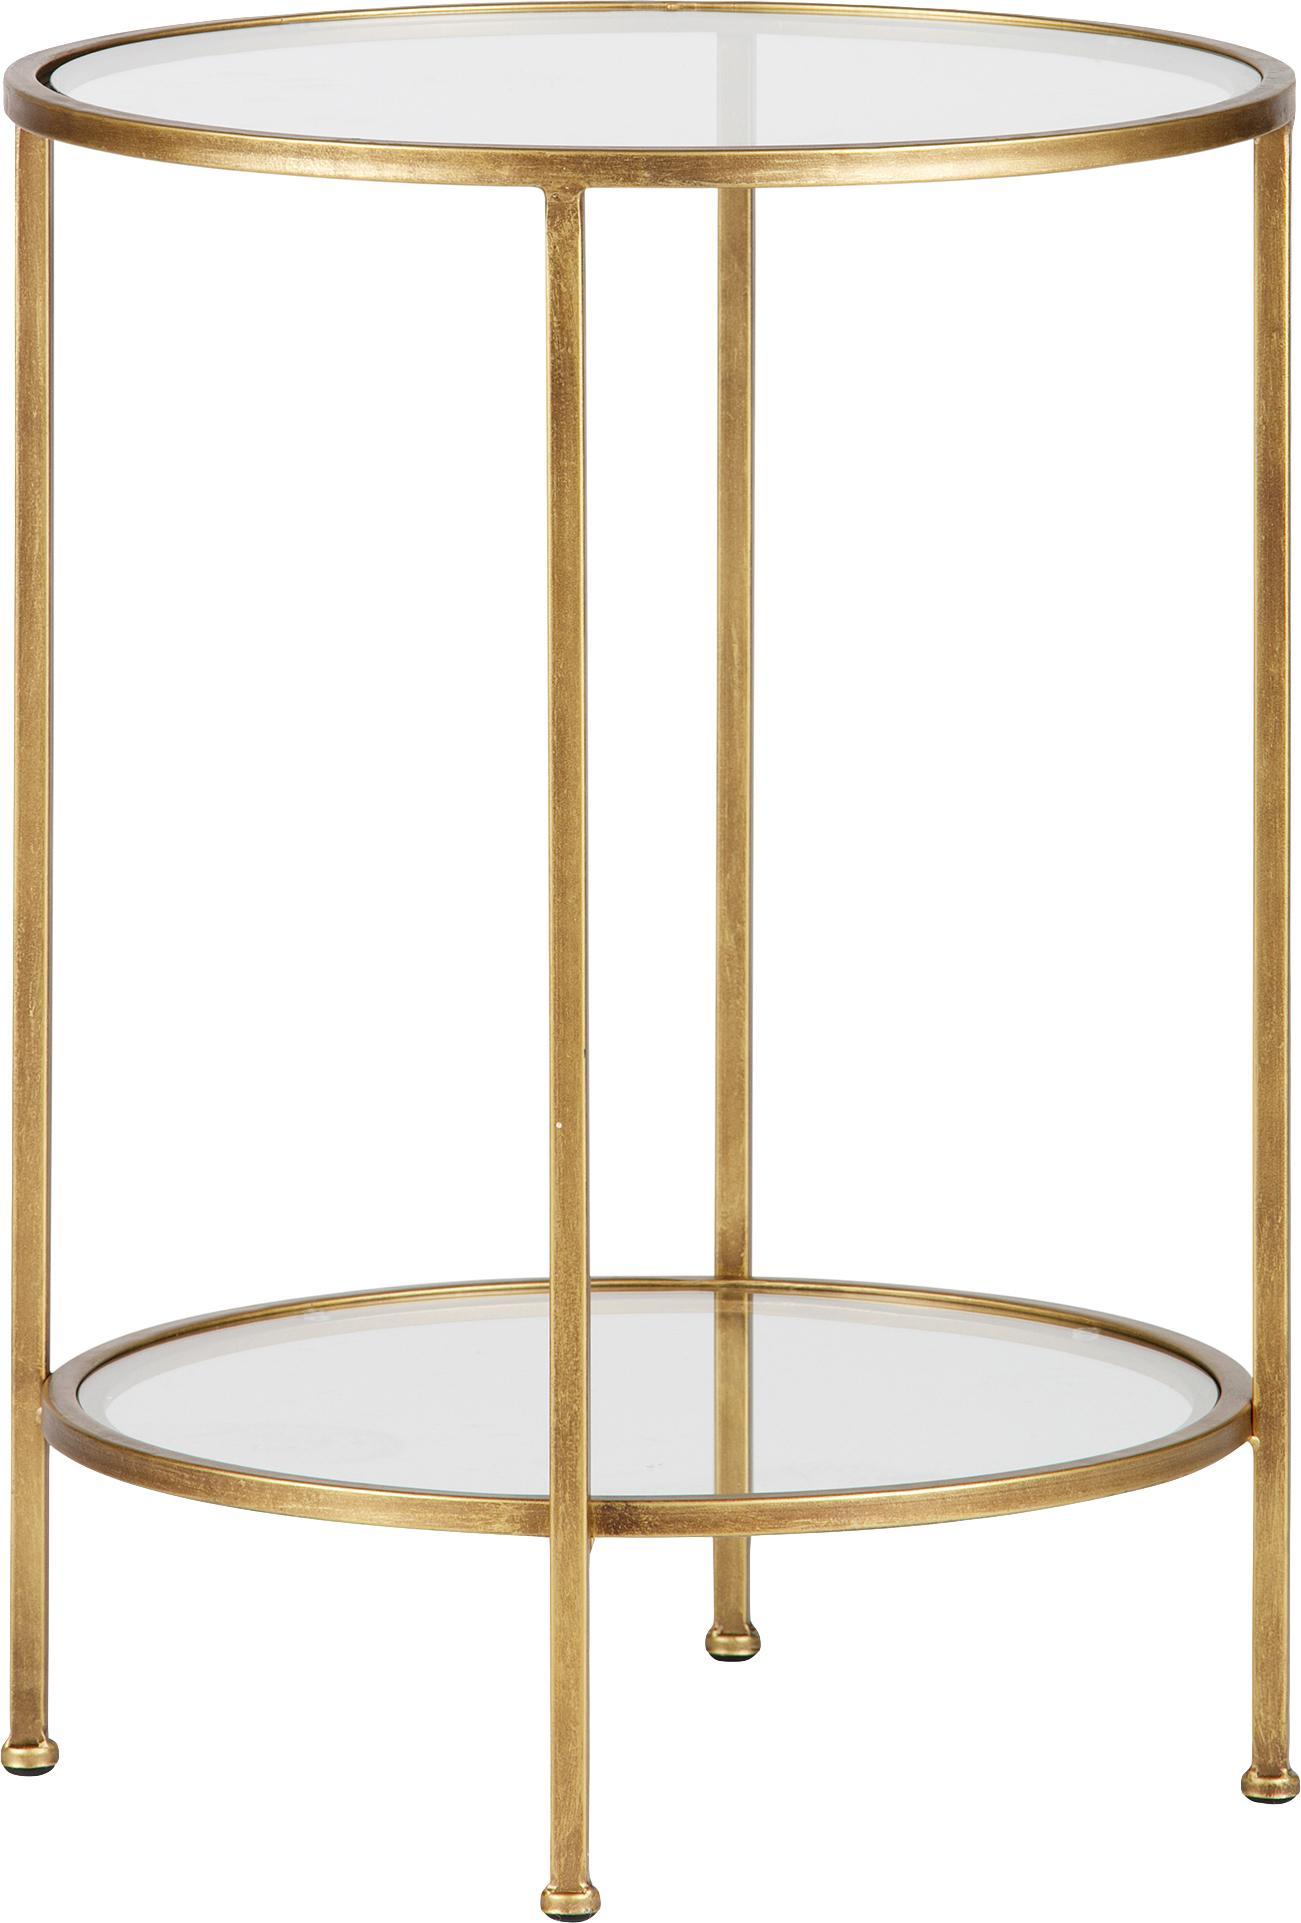 Bijzettafel met glazen tafelblad Goddess in antieke afwerking, Frame: vermessingd metaal met an, Frame: messingkleurig, antieke afwerking, plateau en tafelblad: transparant, Ø 46 x H 61 cm